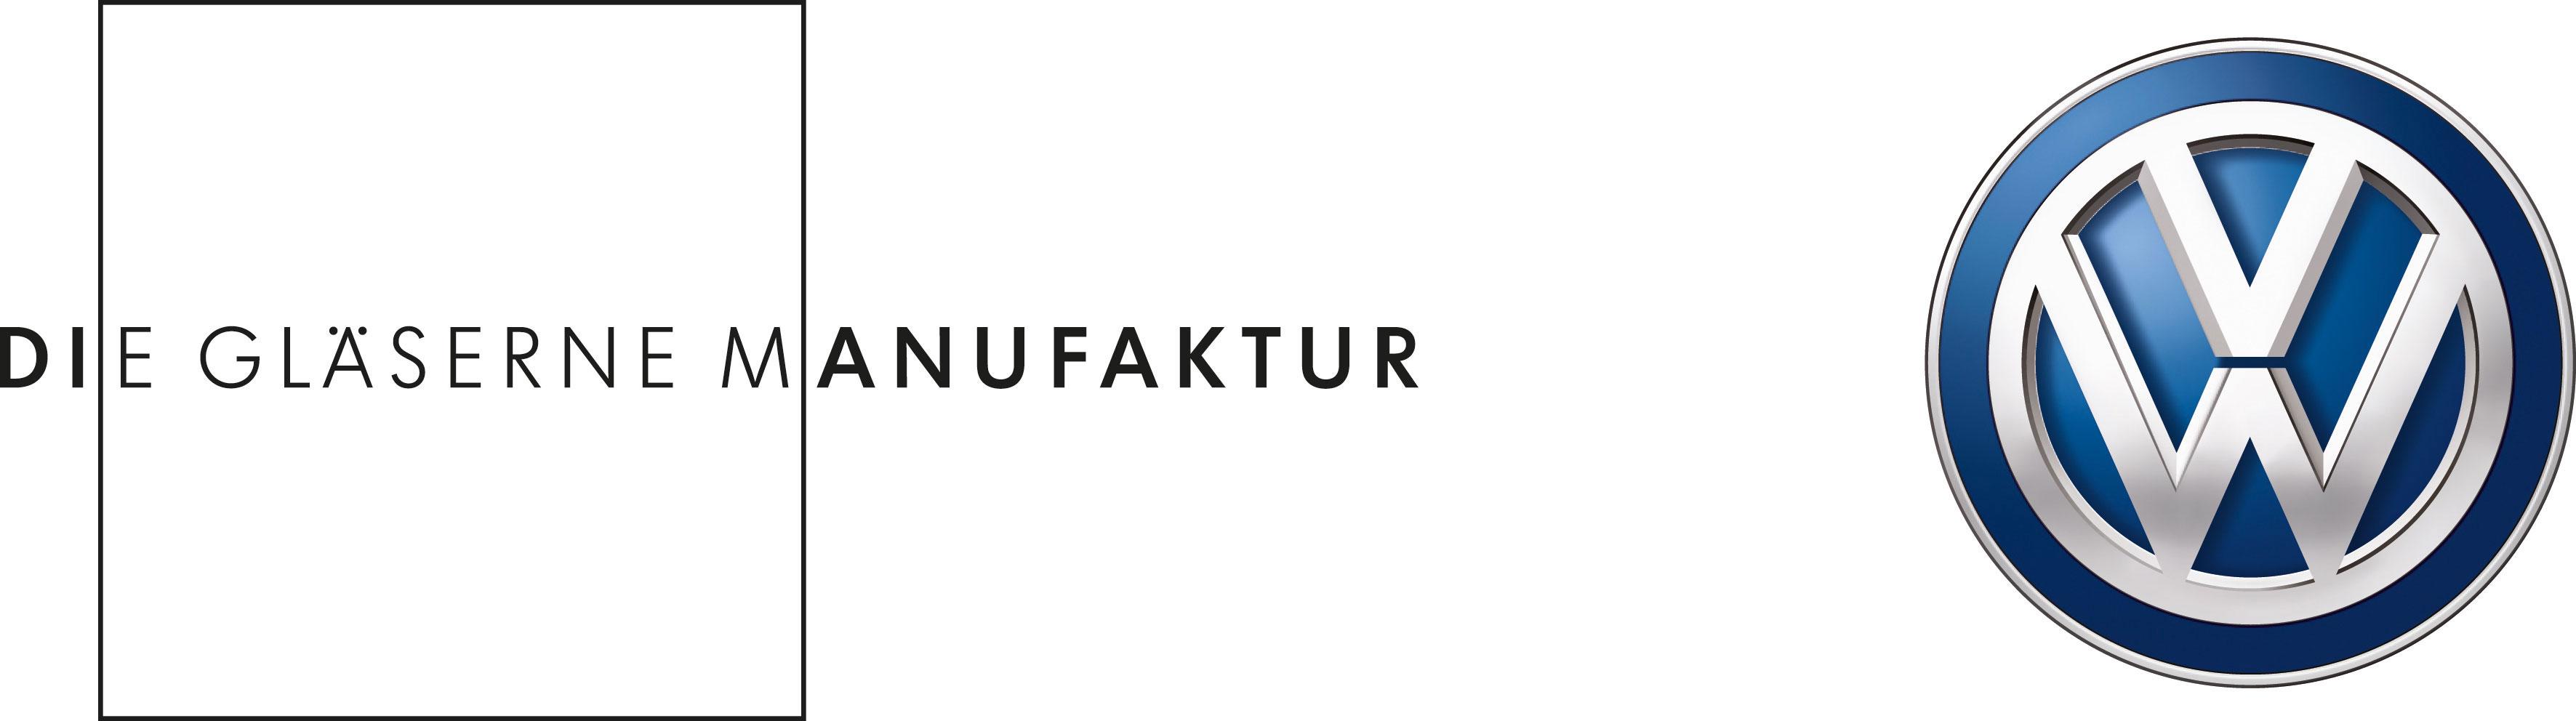 Logo_Gläserne-Manufaktur_WEB